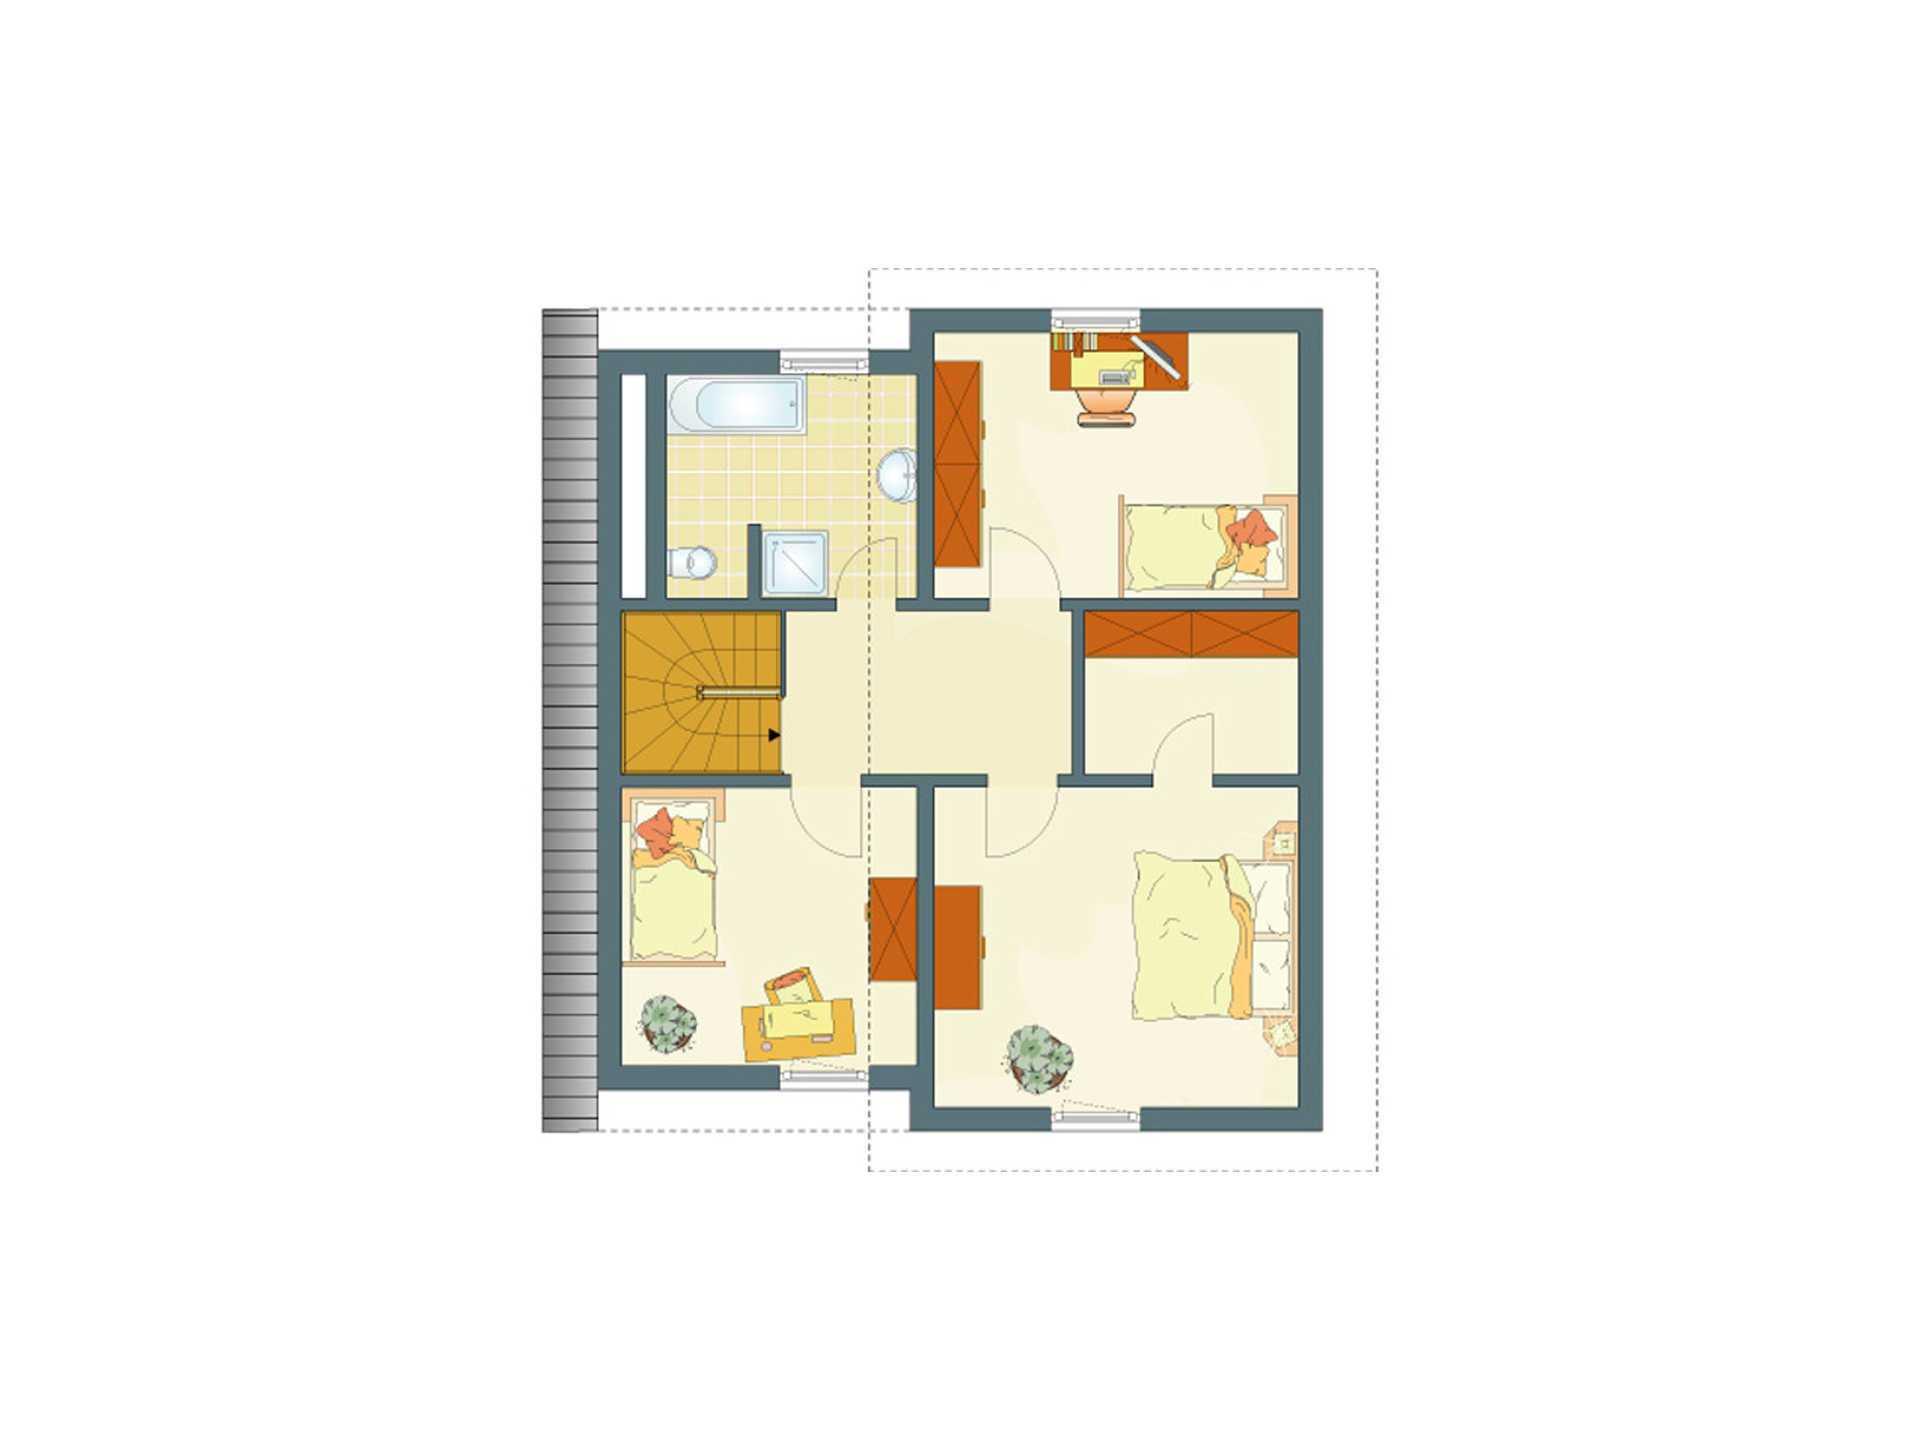 pultdachhaus ventur 100 fingerhaus. Black Bedroom Furniture Sets. Home Design Ideas